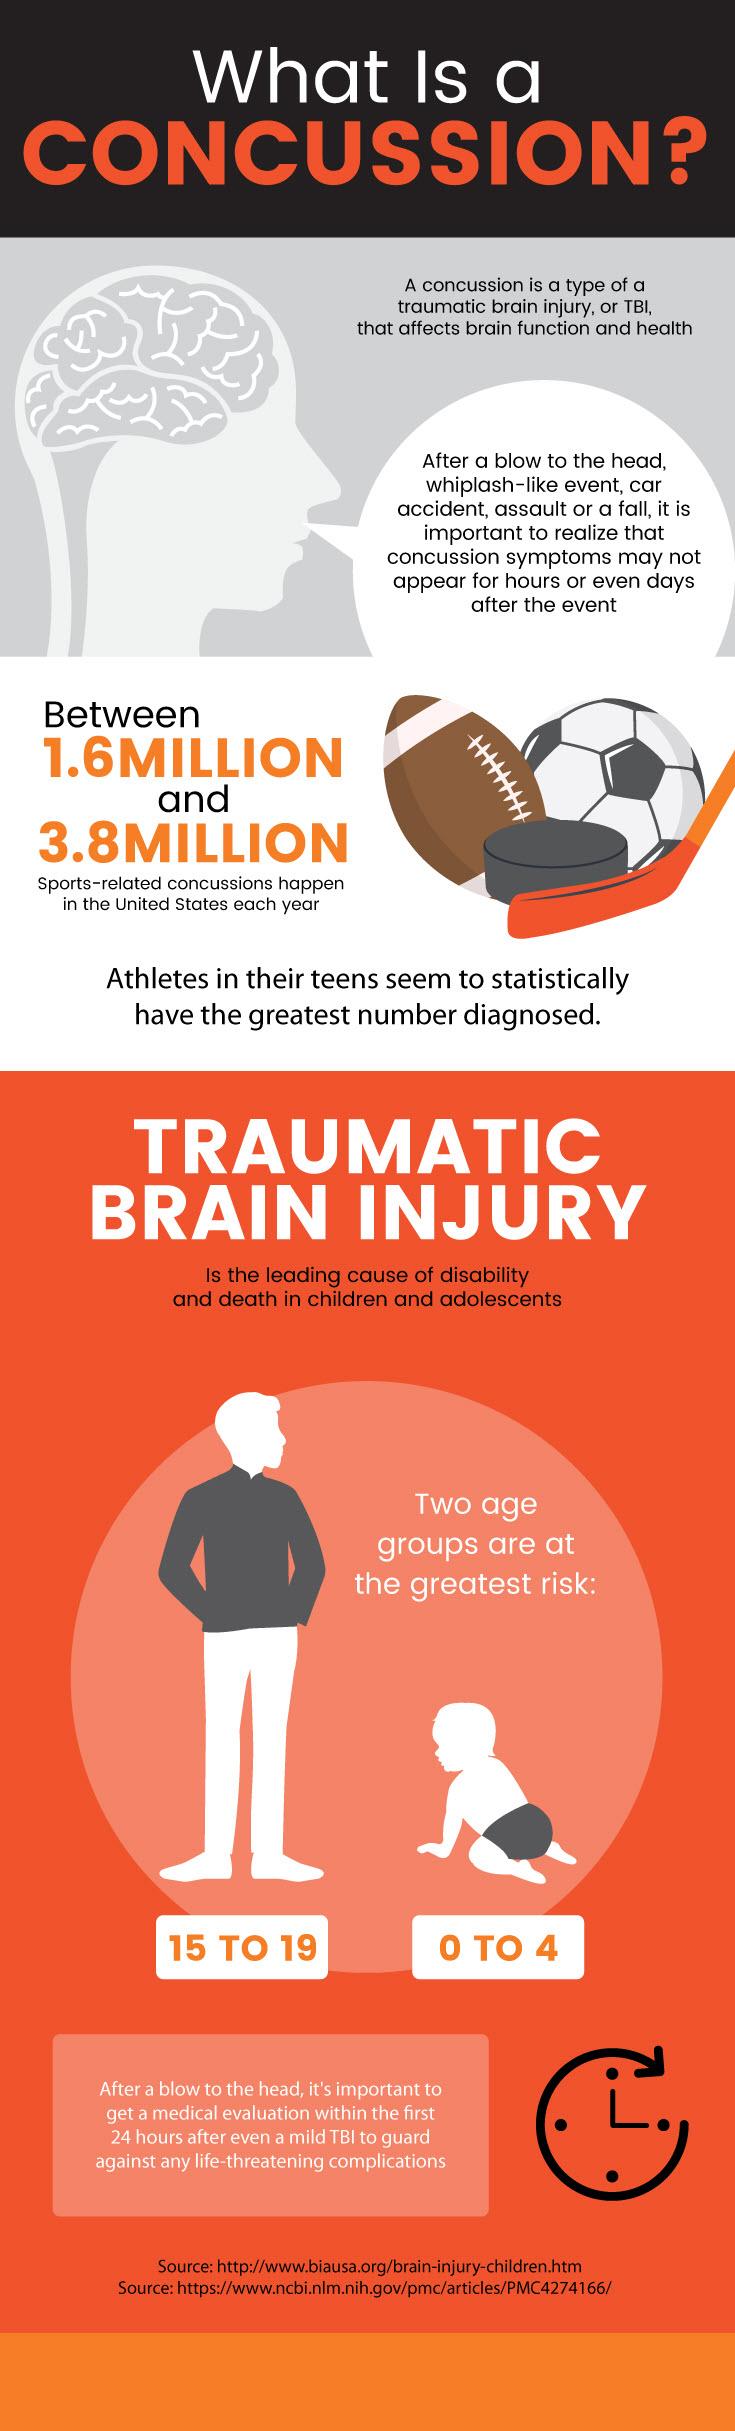 What is a concussion?: concussion symptoms - MKexpress.net